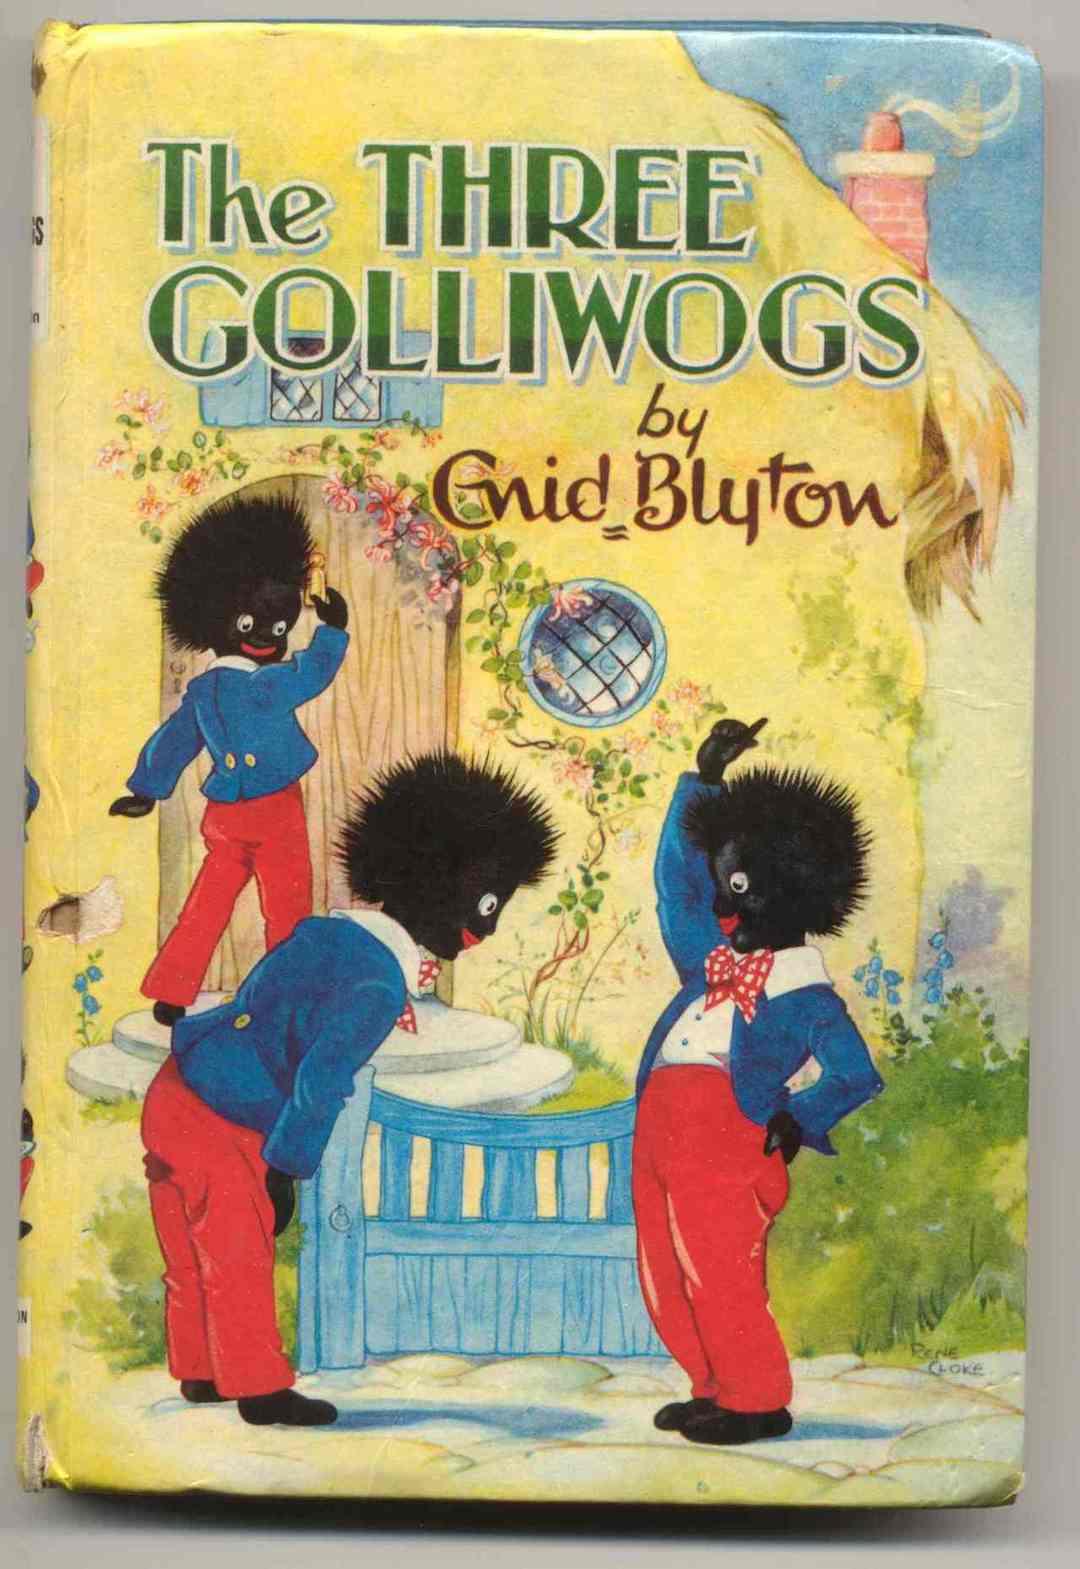 Golliwogs book cover